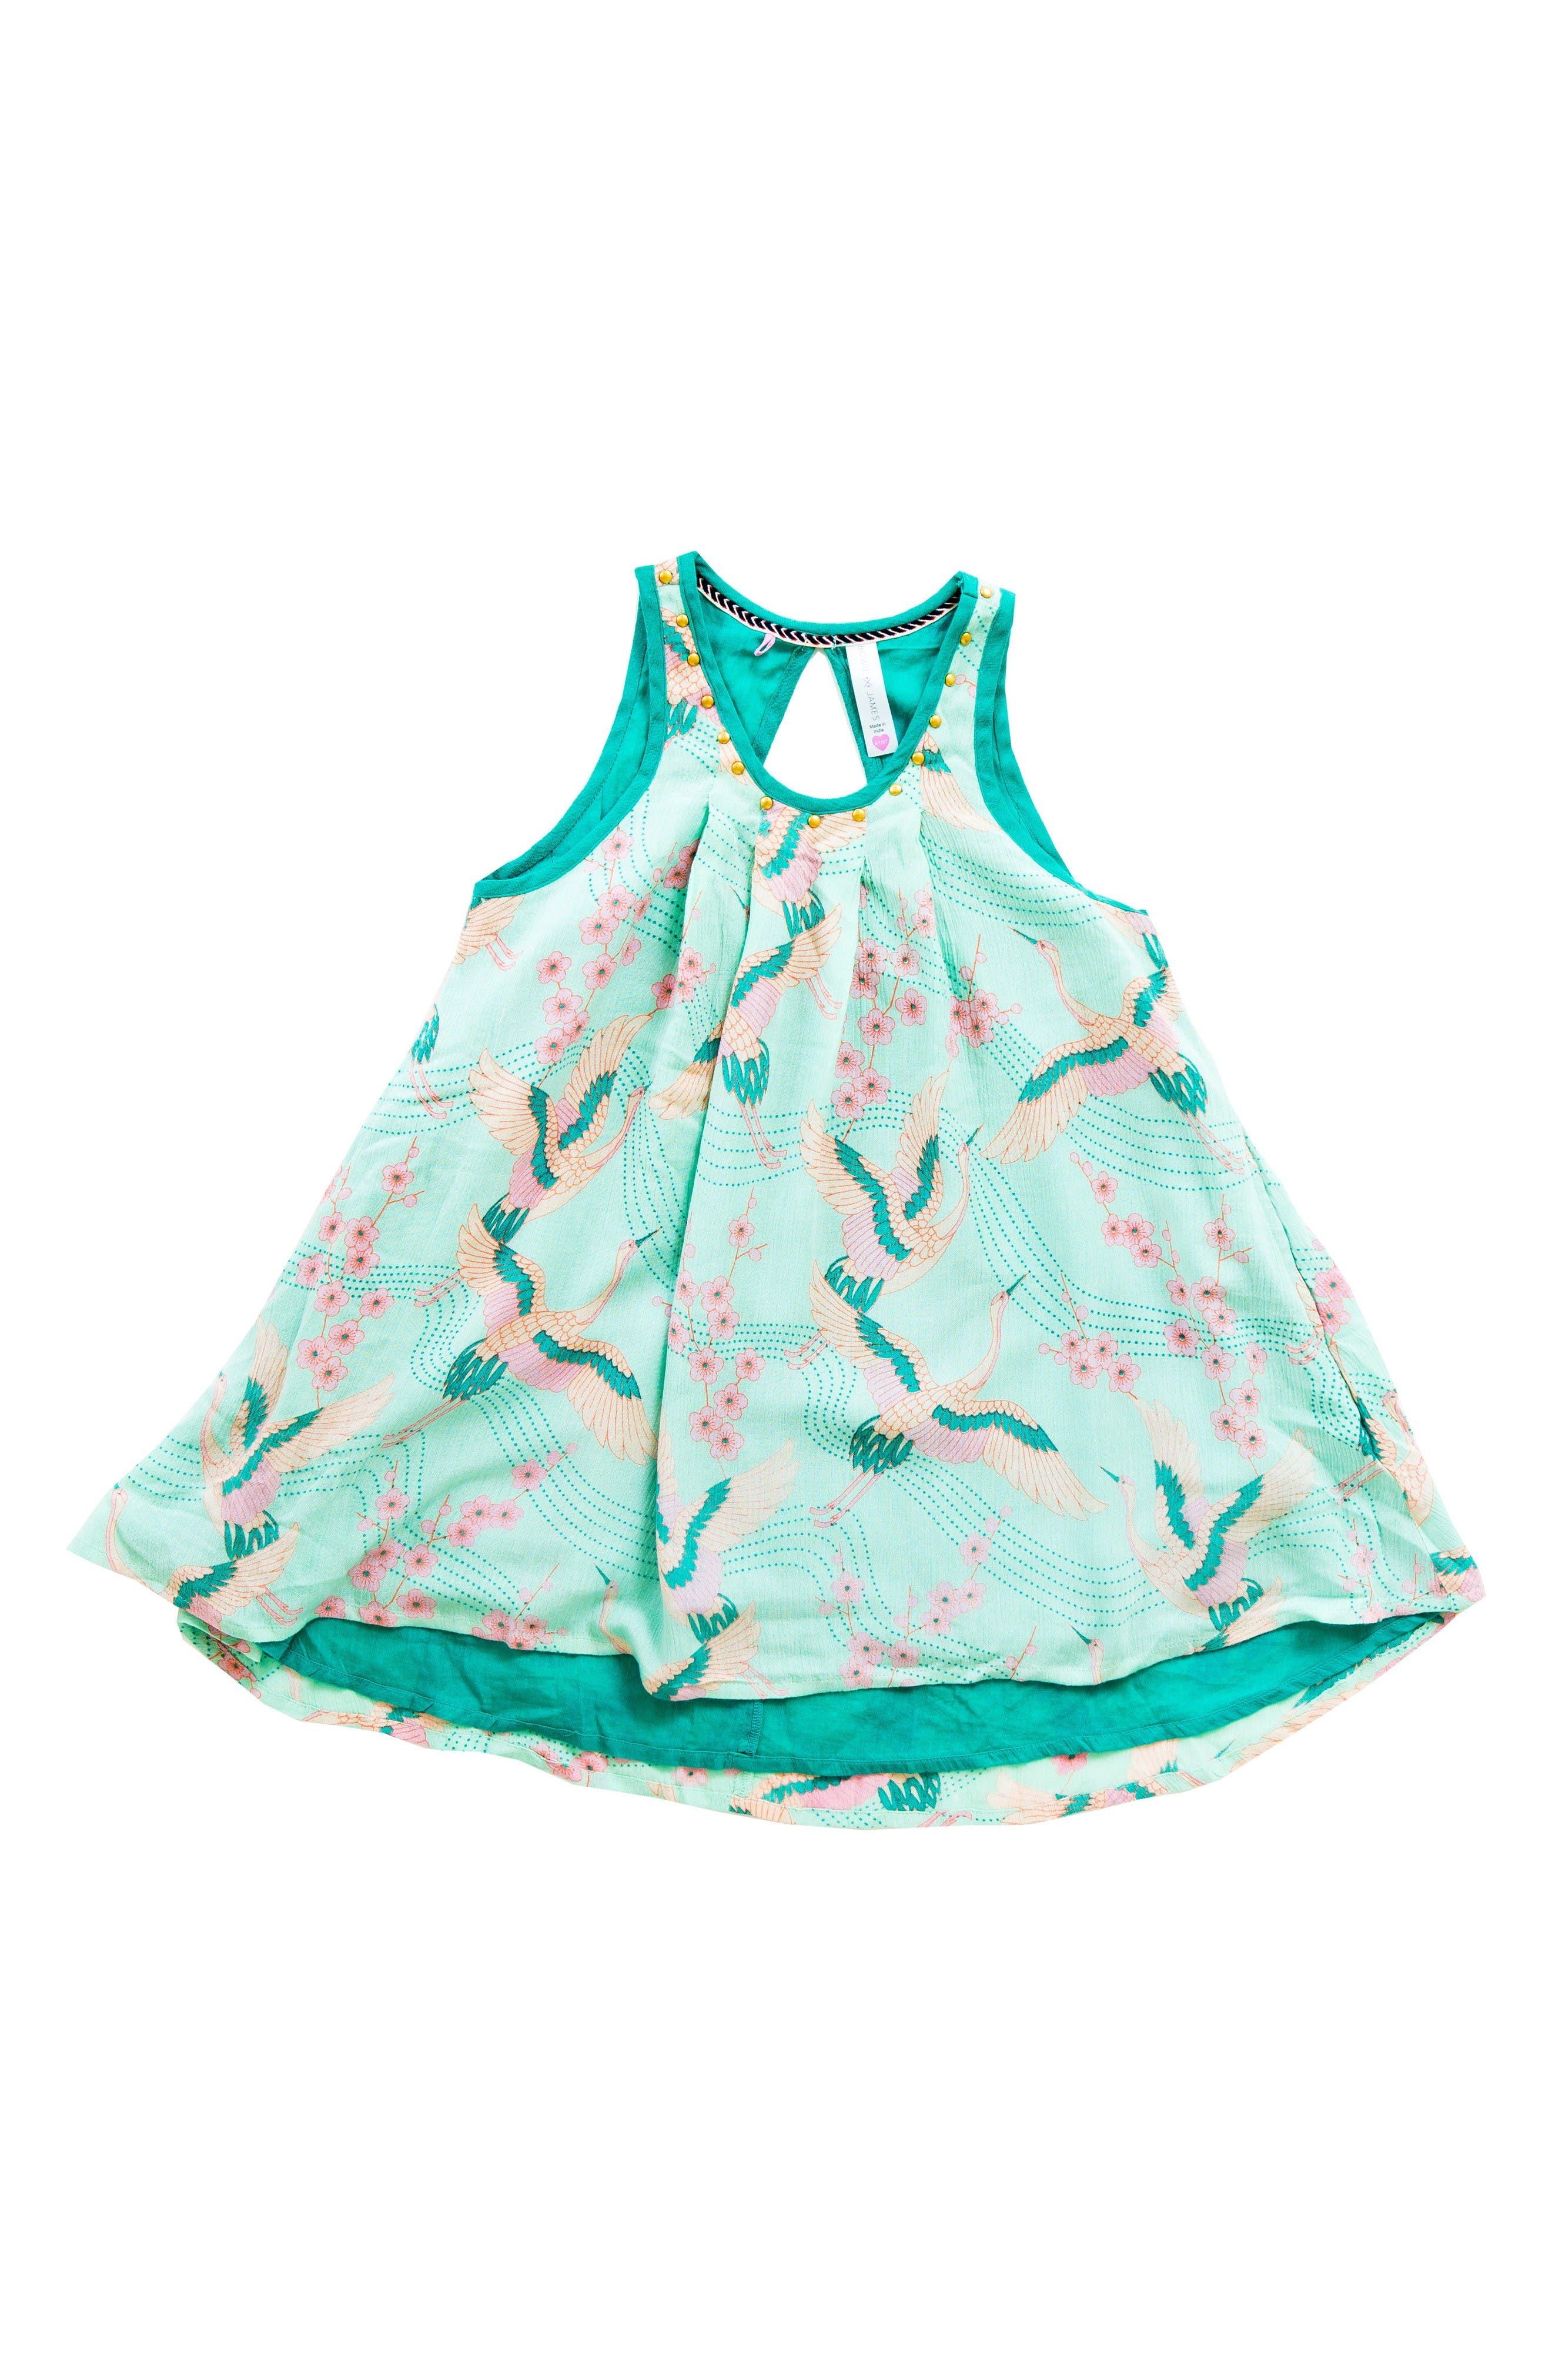 BOWIE X JAMES Print Trapeze Dress